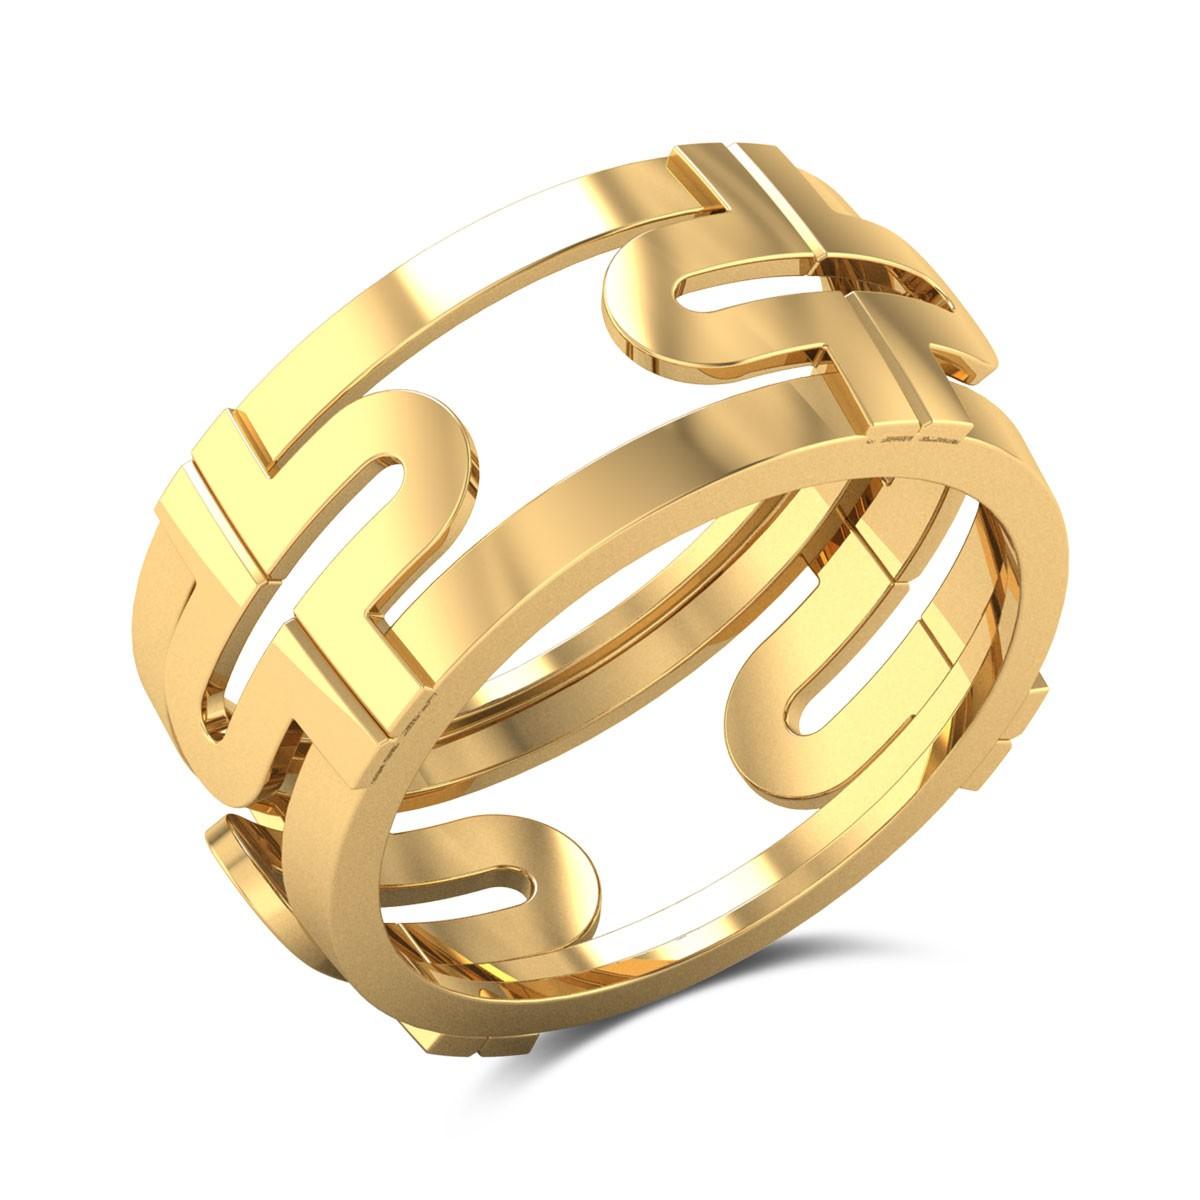 Aesha Lively Gold Ring